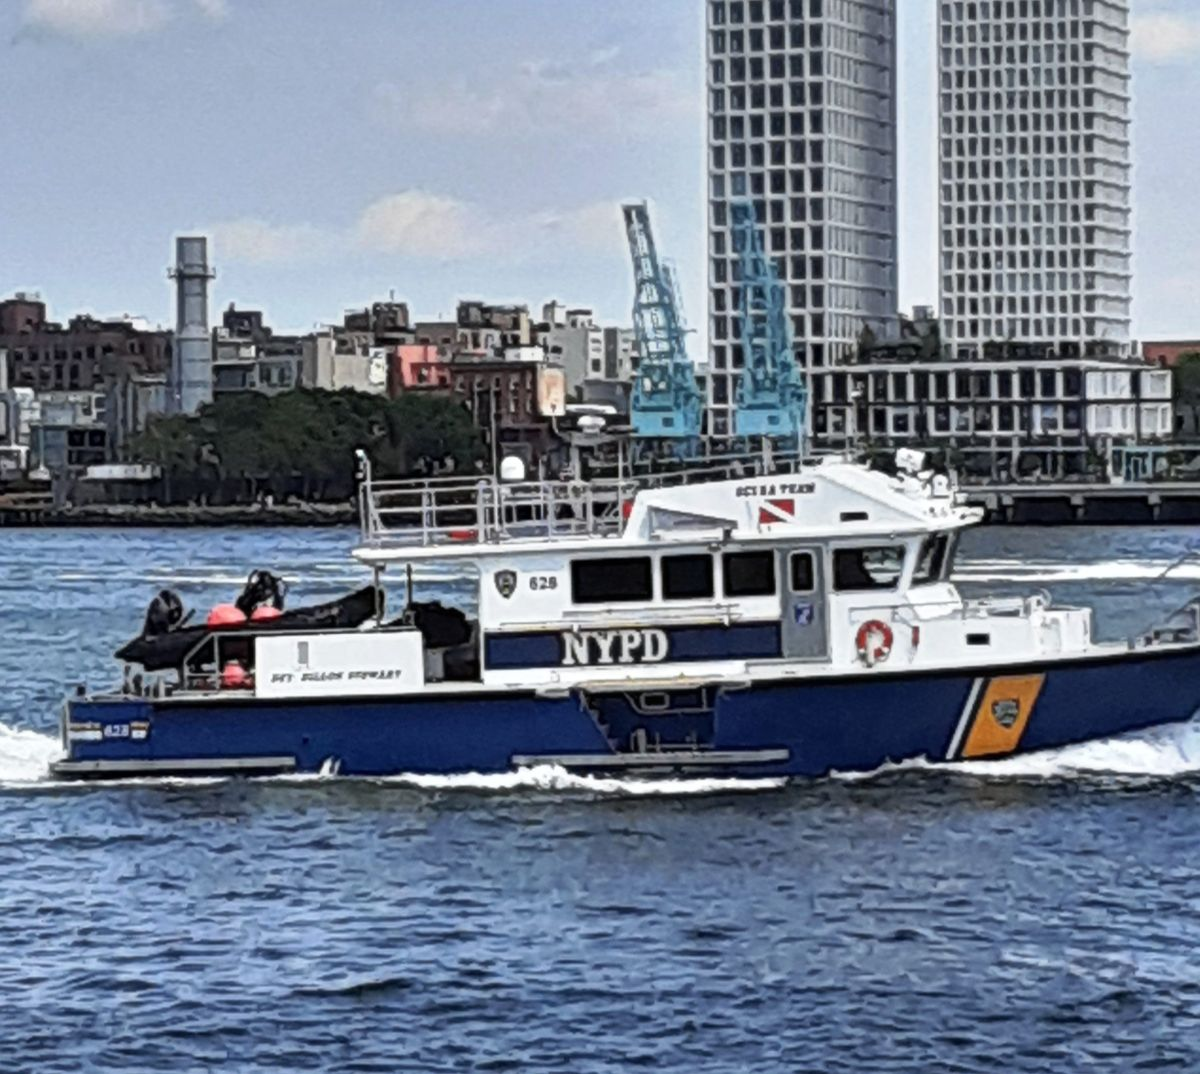 Hombre se ahogó rescatando una pelota del East River en Nueva York